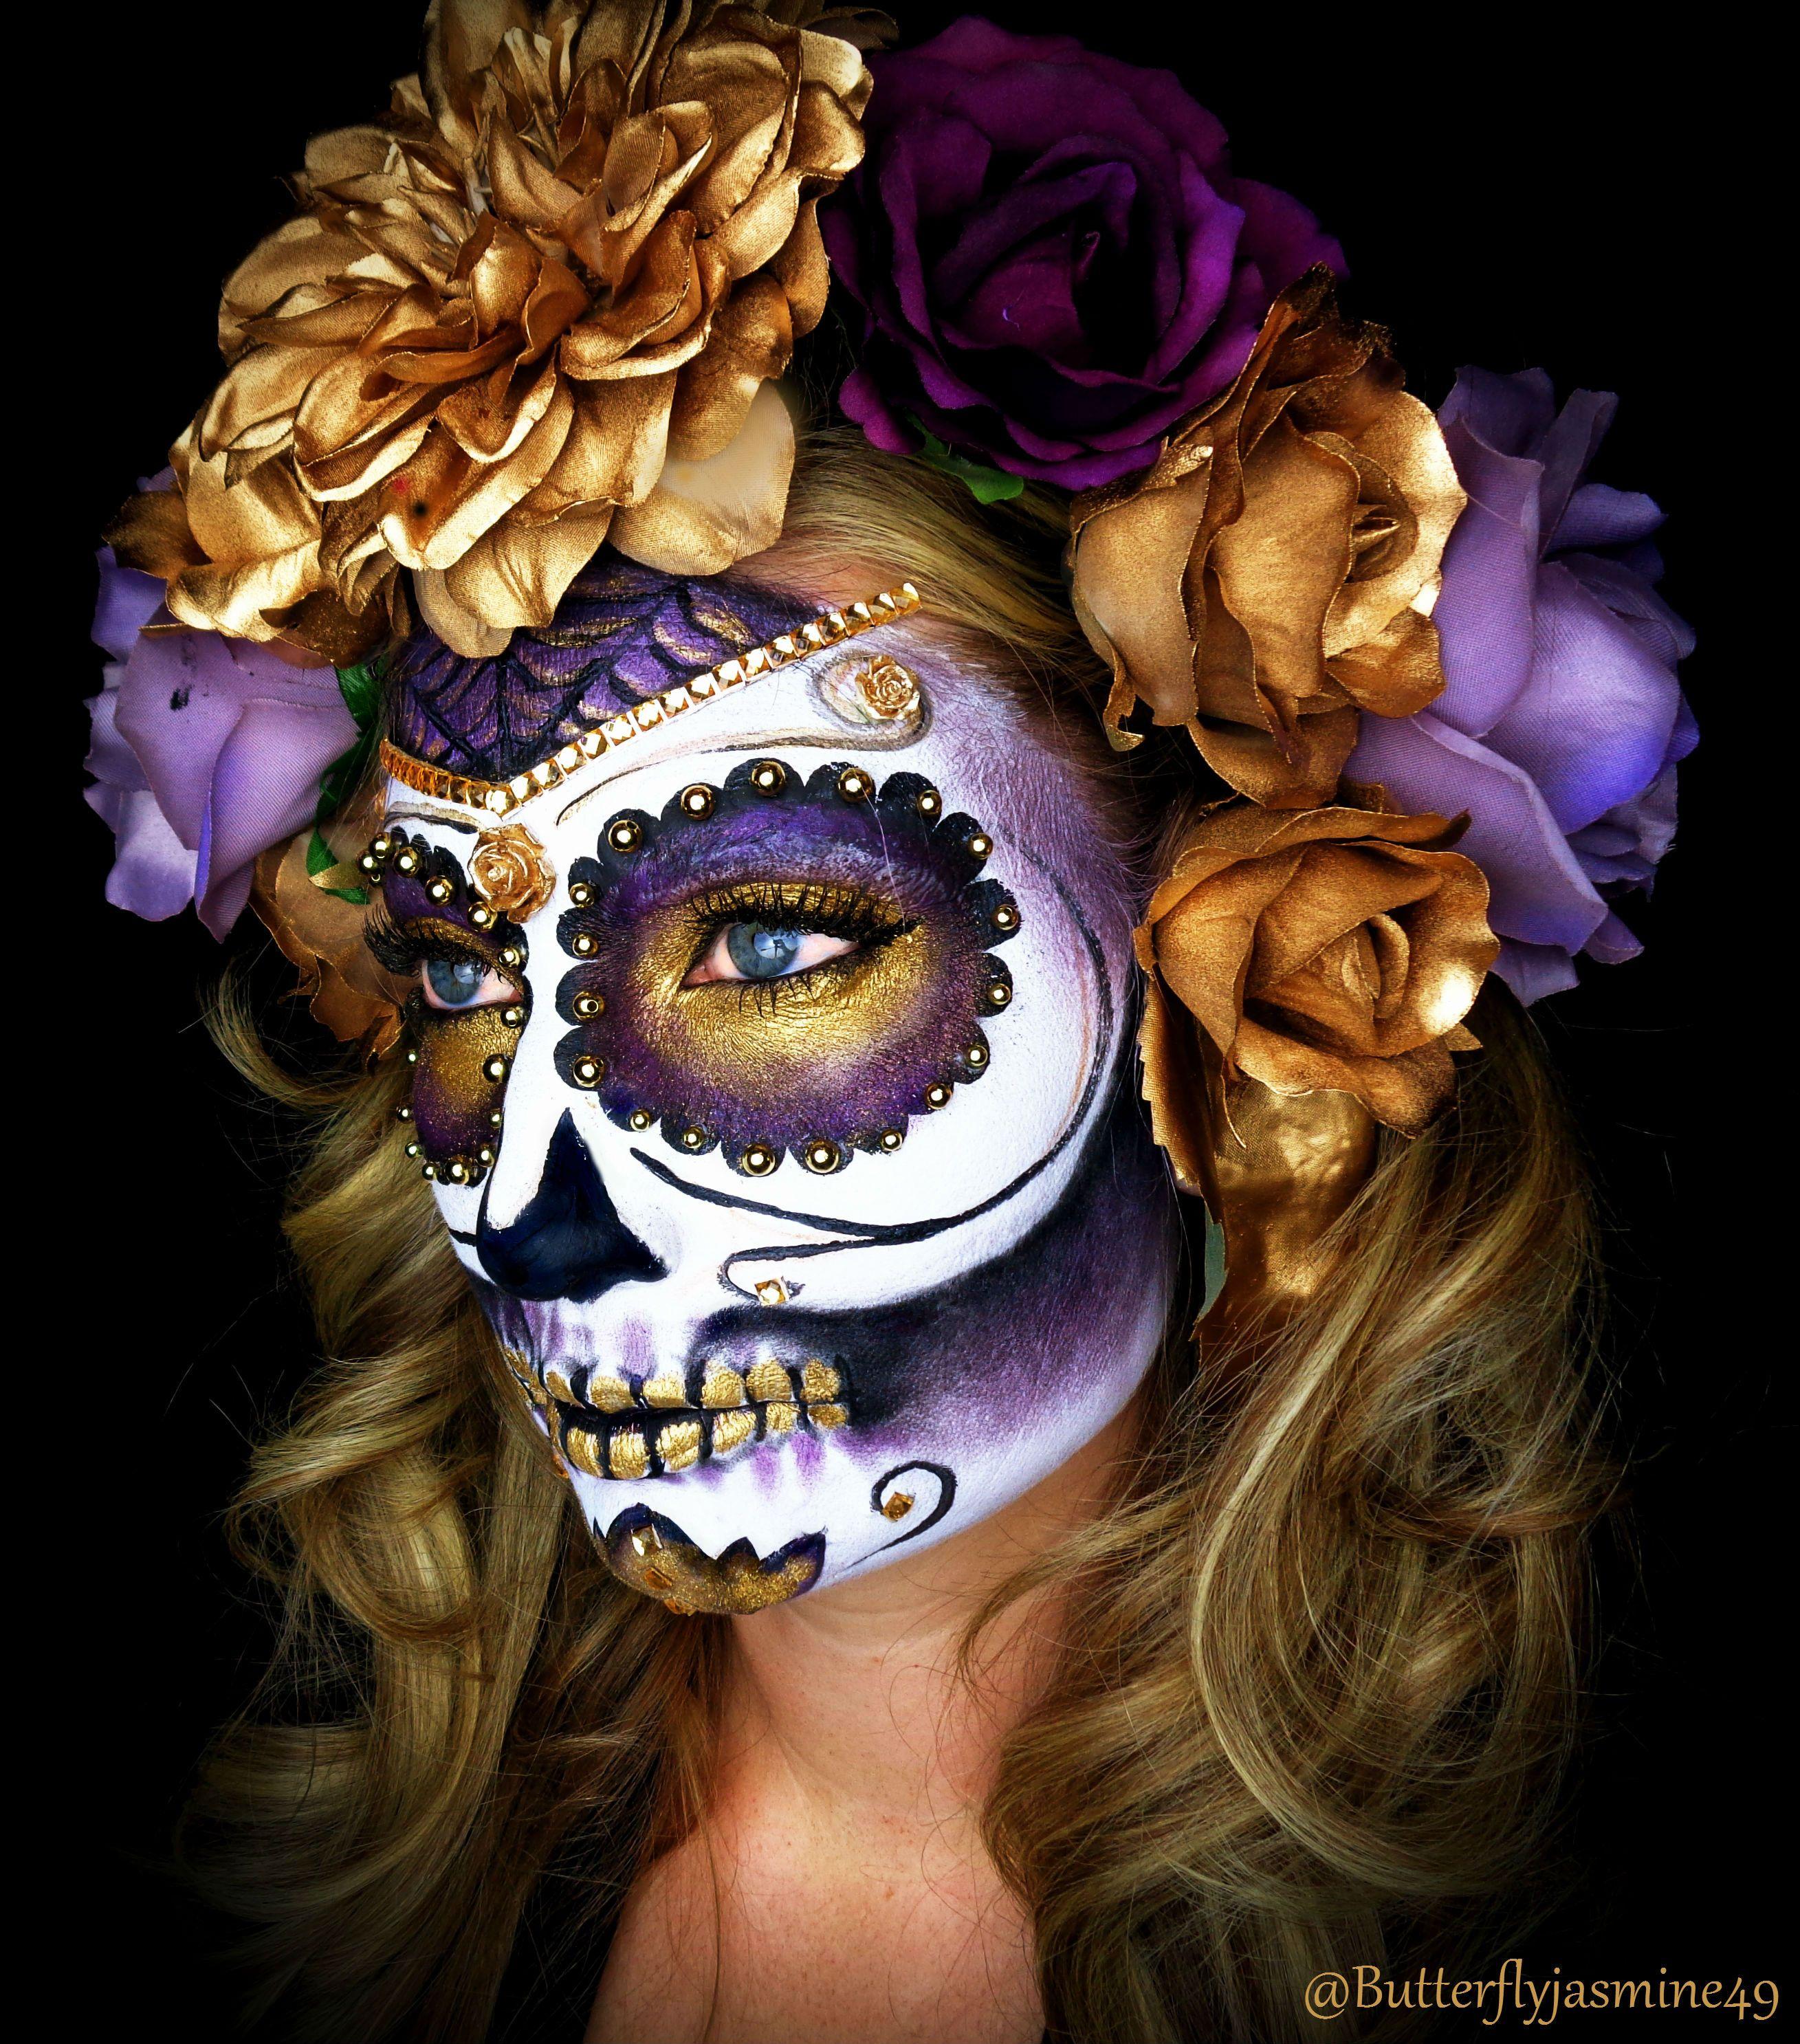 Sugar Skull makeup Halloween Makeup/Beauty Halloween